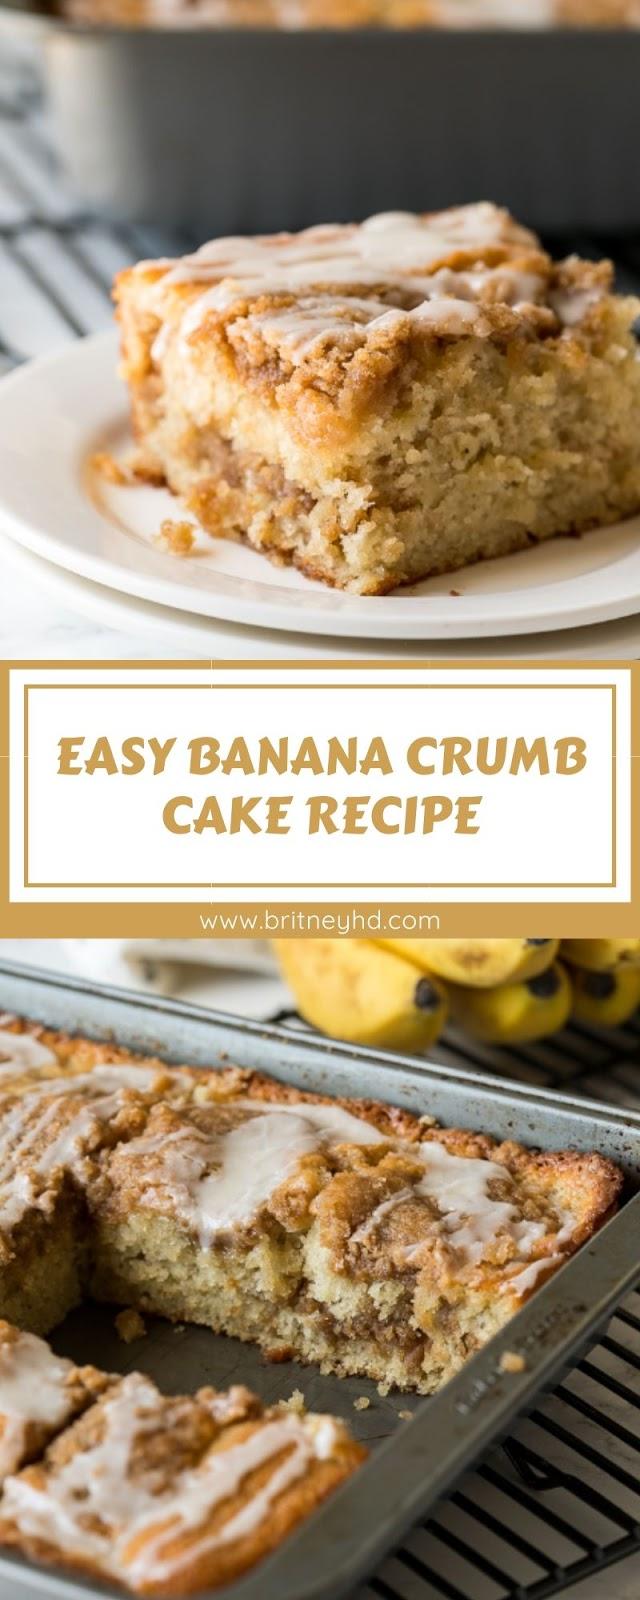 EASY BANANA CRUMB CAKE RECIPE